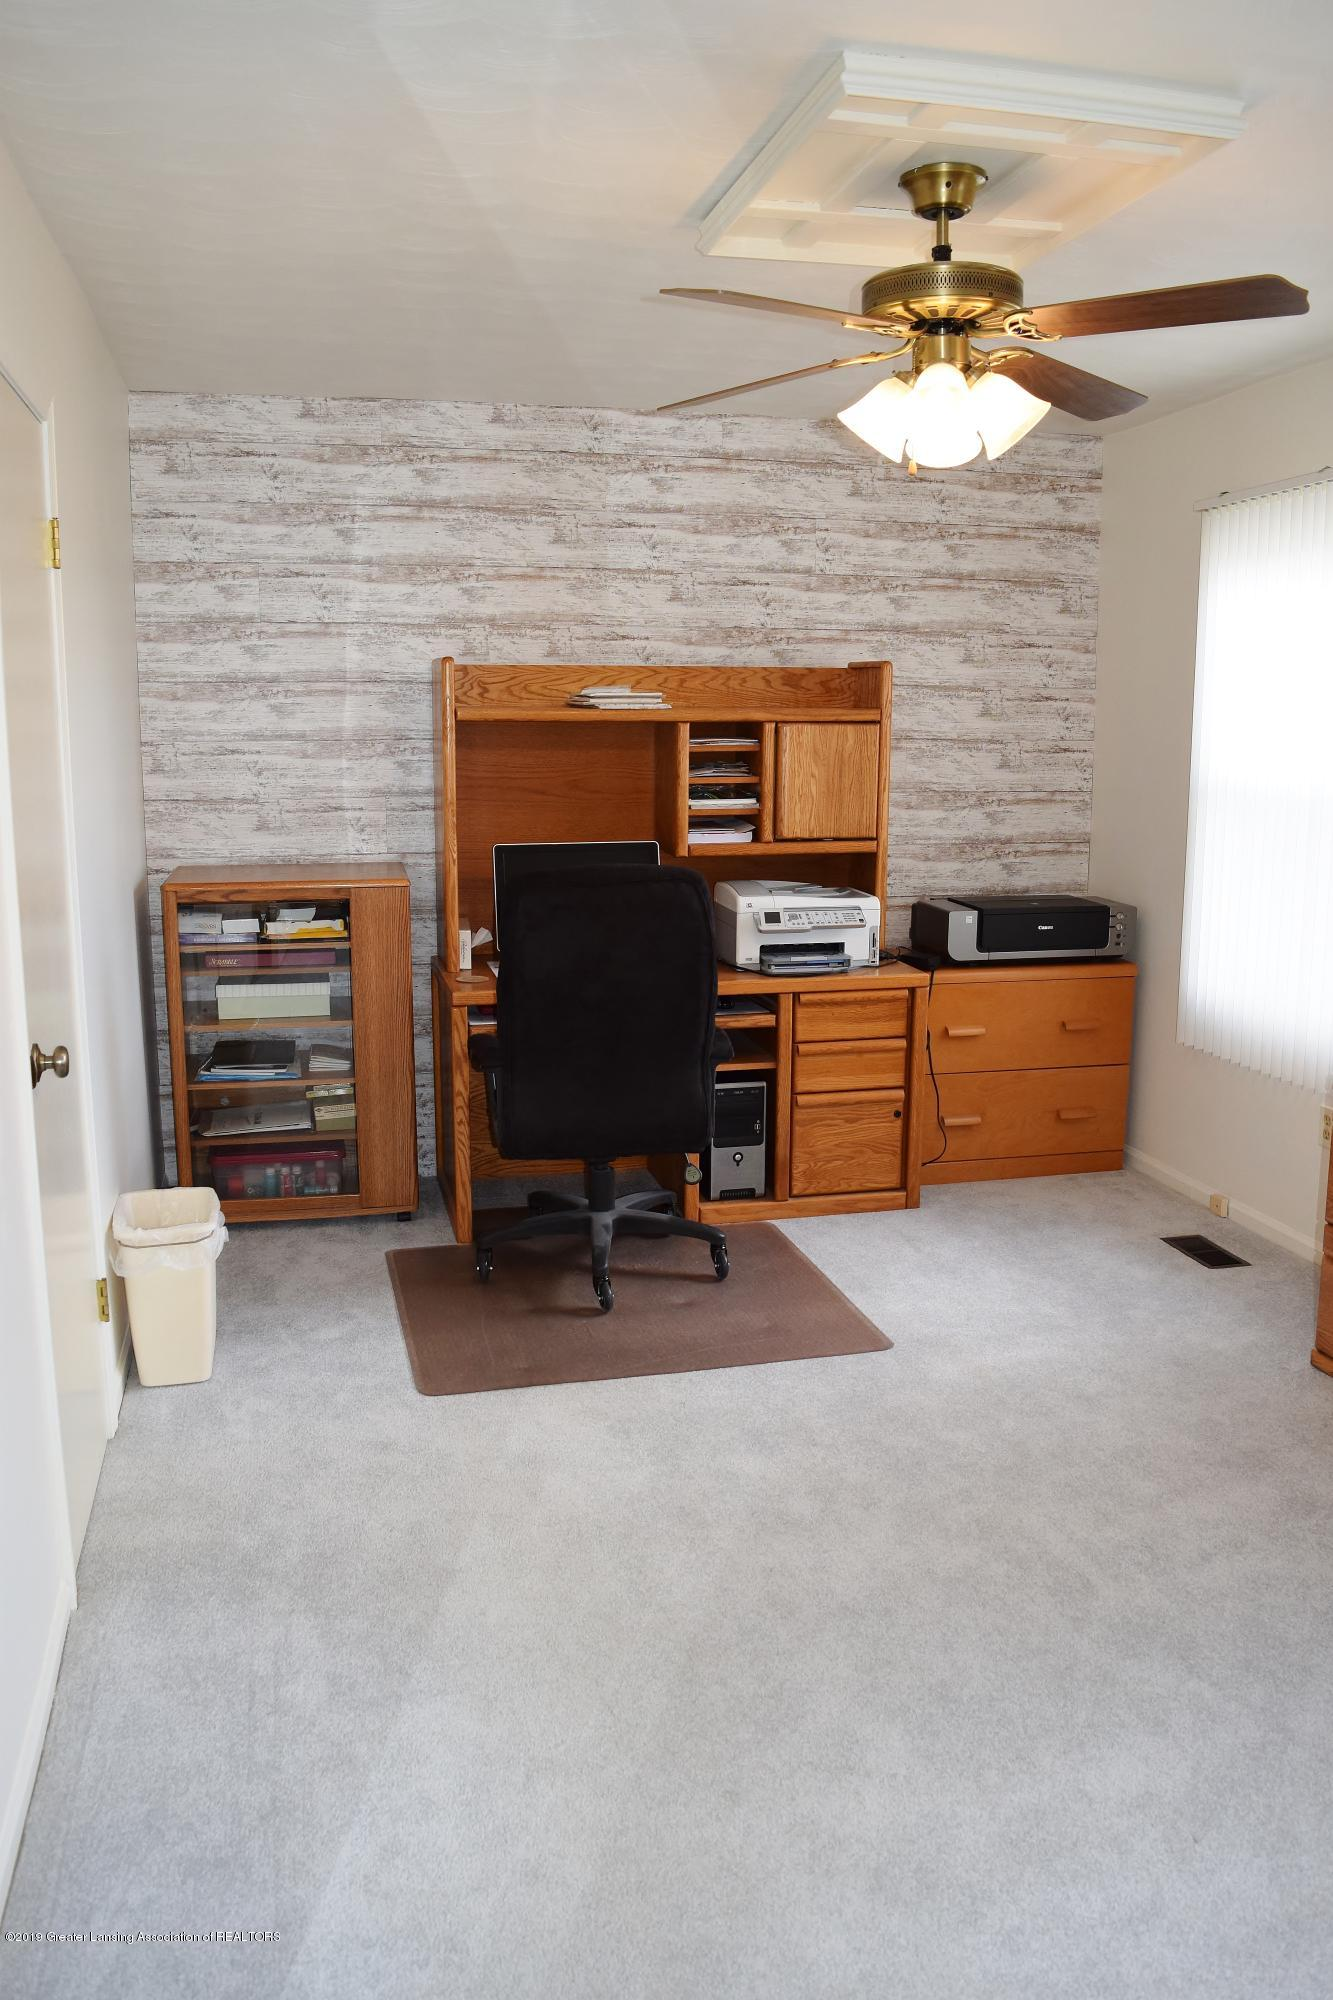 2817 N Gunnell Rd - Bedroom 4 - 2